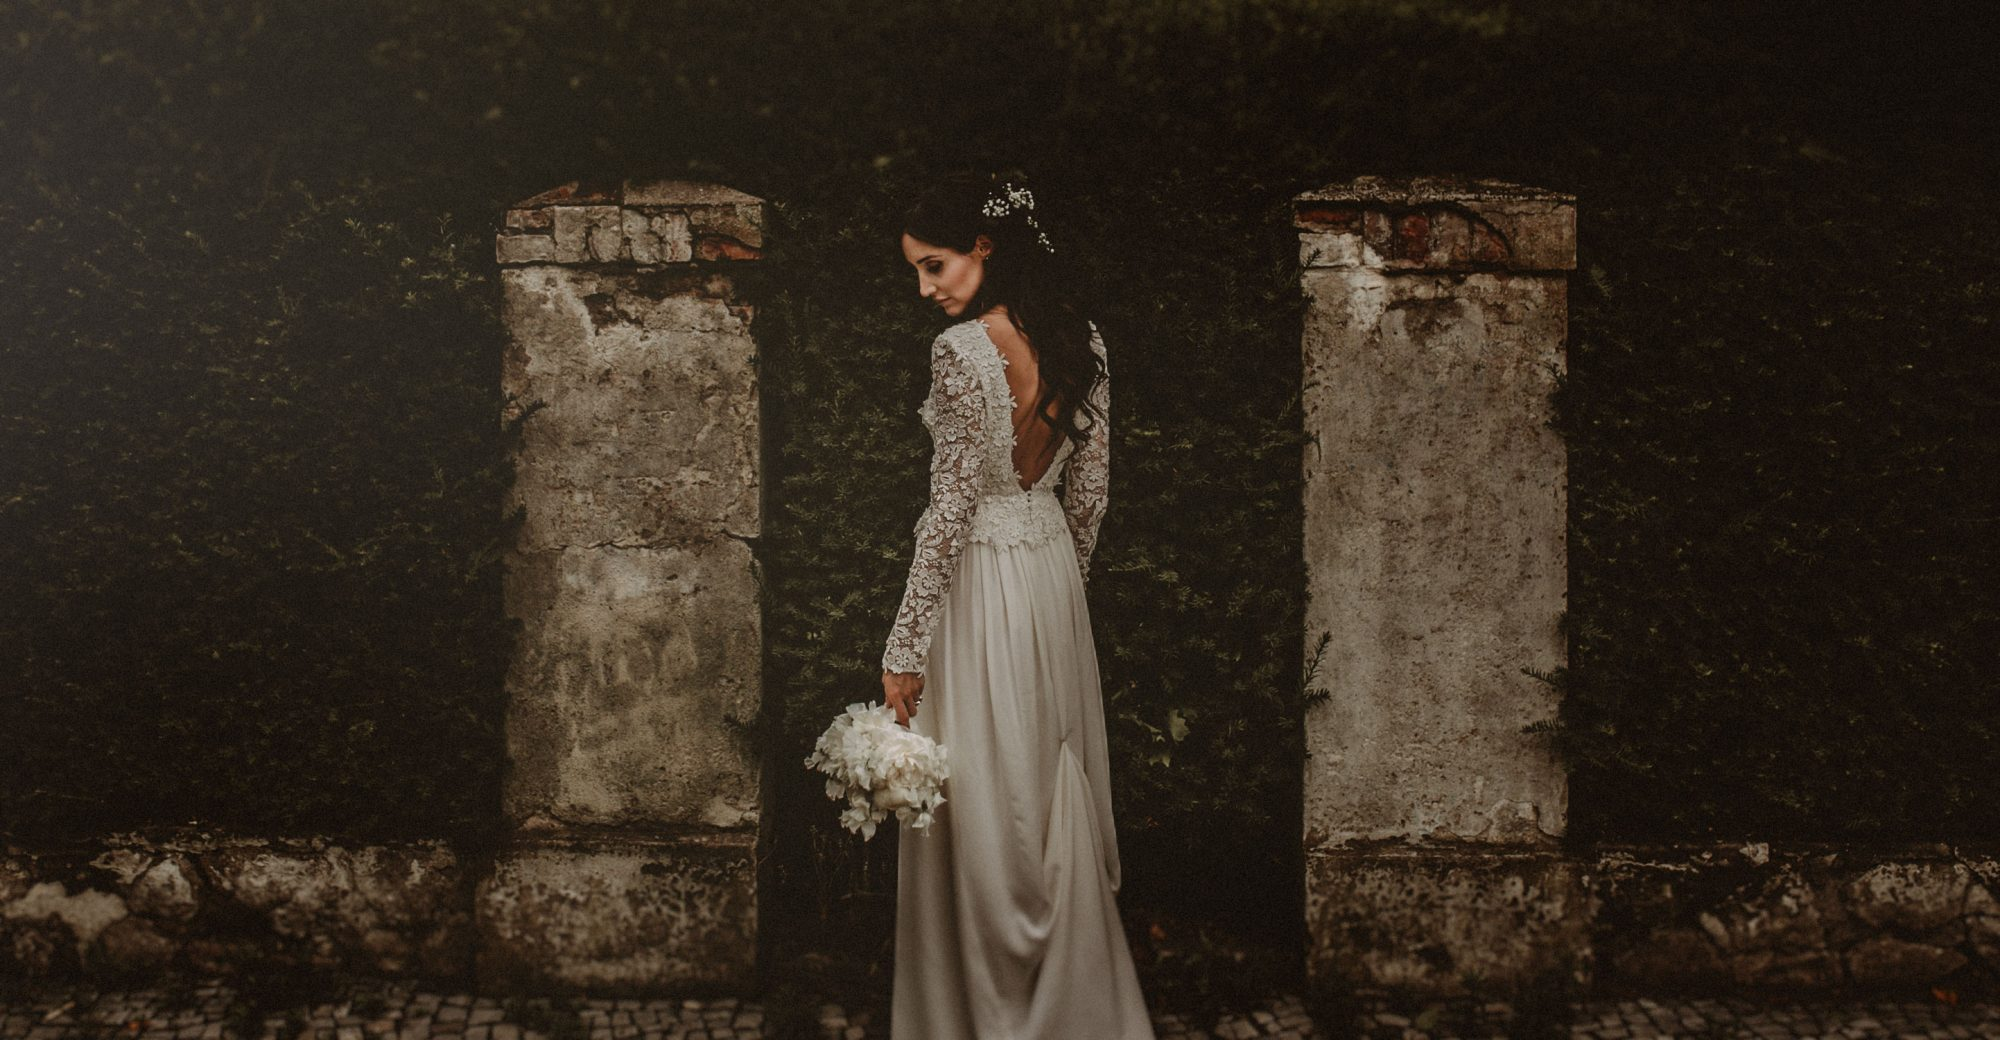 Elegant wedding Photographer in Berlin